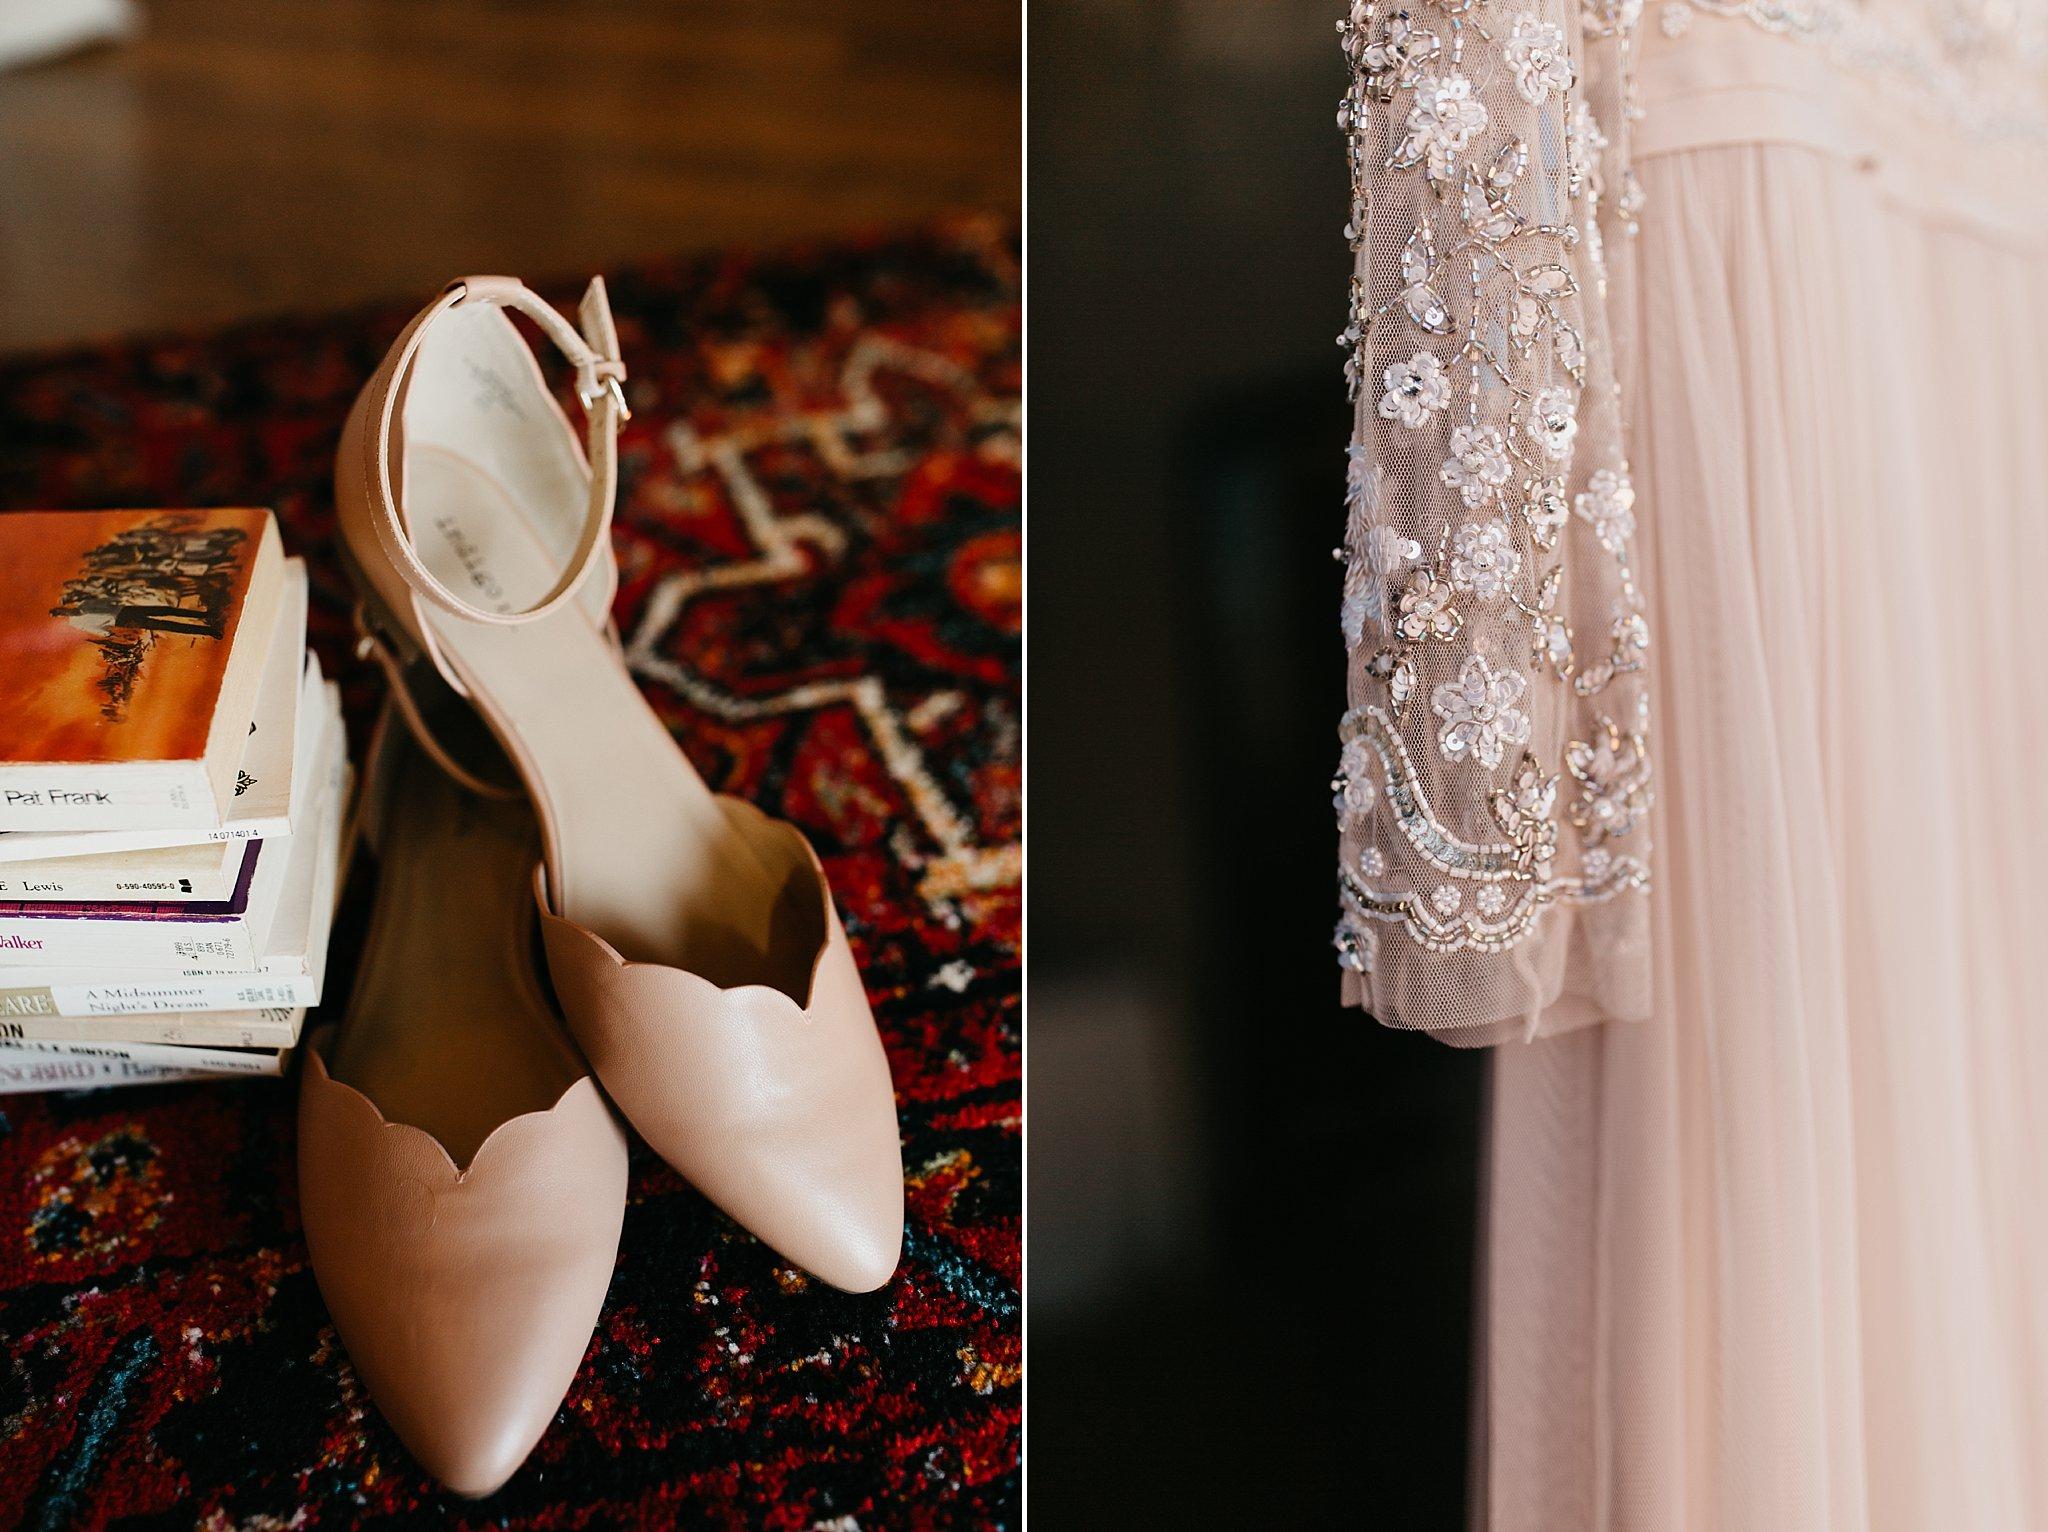 Wilderlove Co_Waco Texas_The Phoenix_Romantic Wedding Photography_0002.jpg